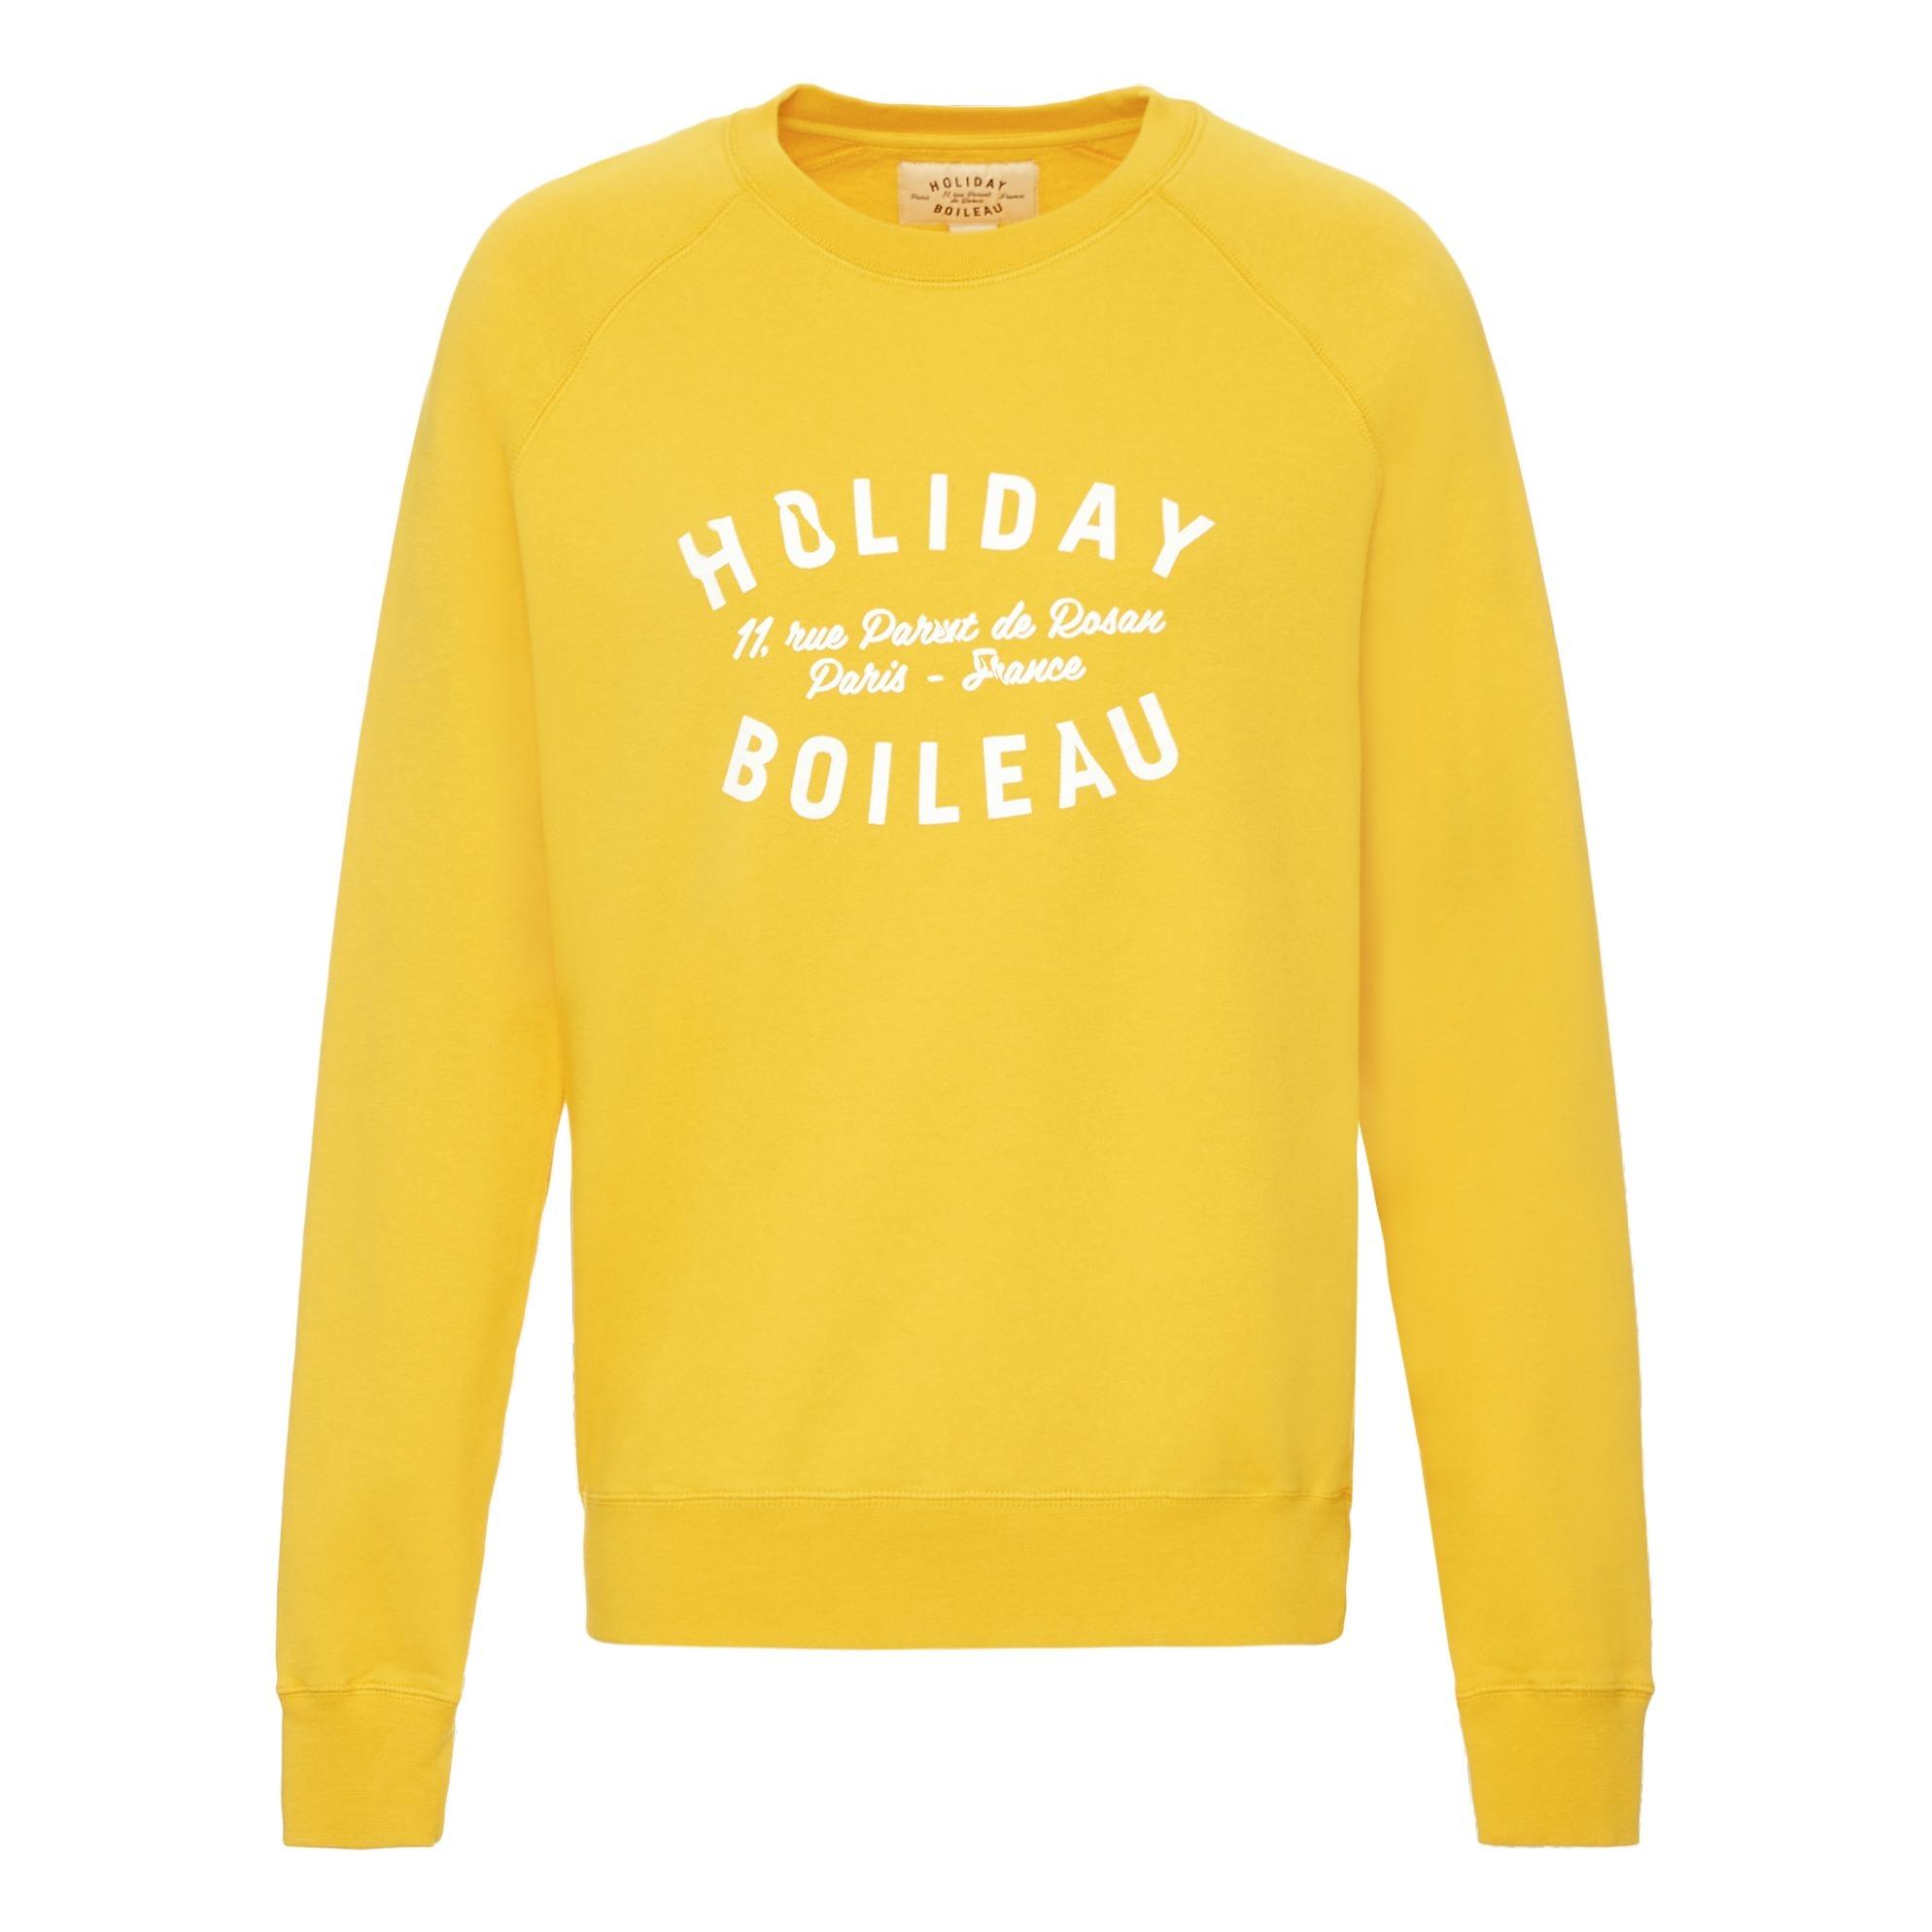 Sweatshirt Holiday Boileau Hit, Highlight 4314